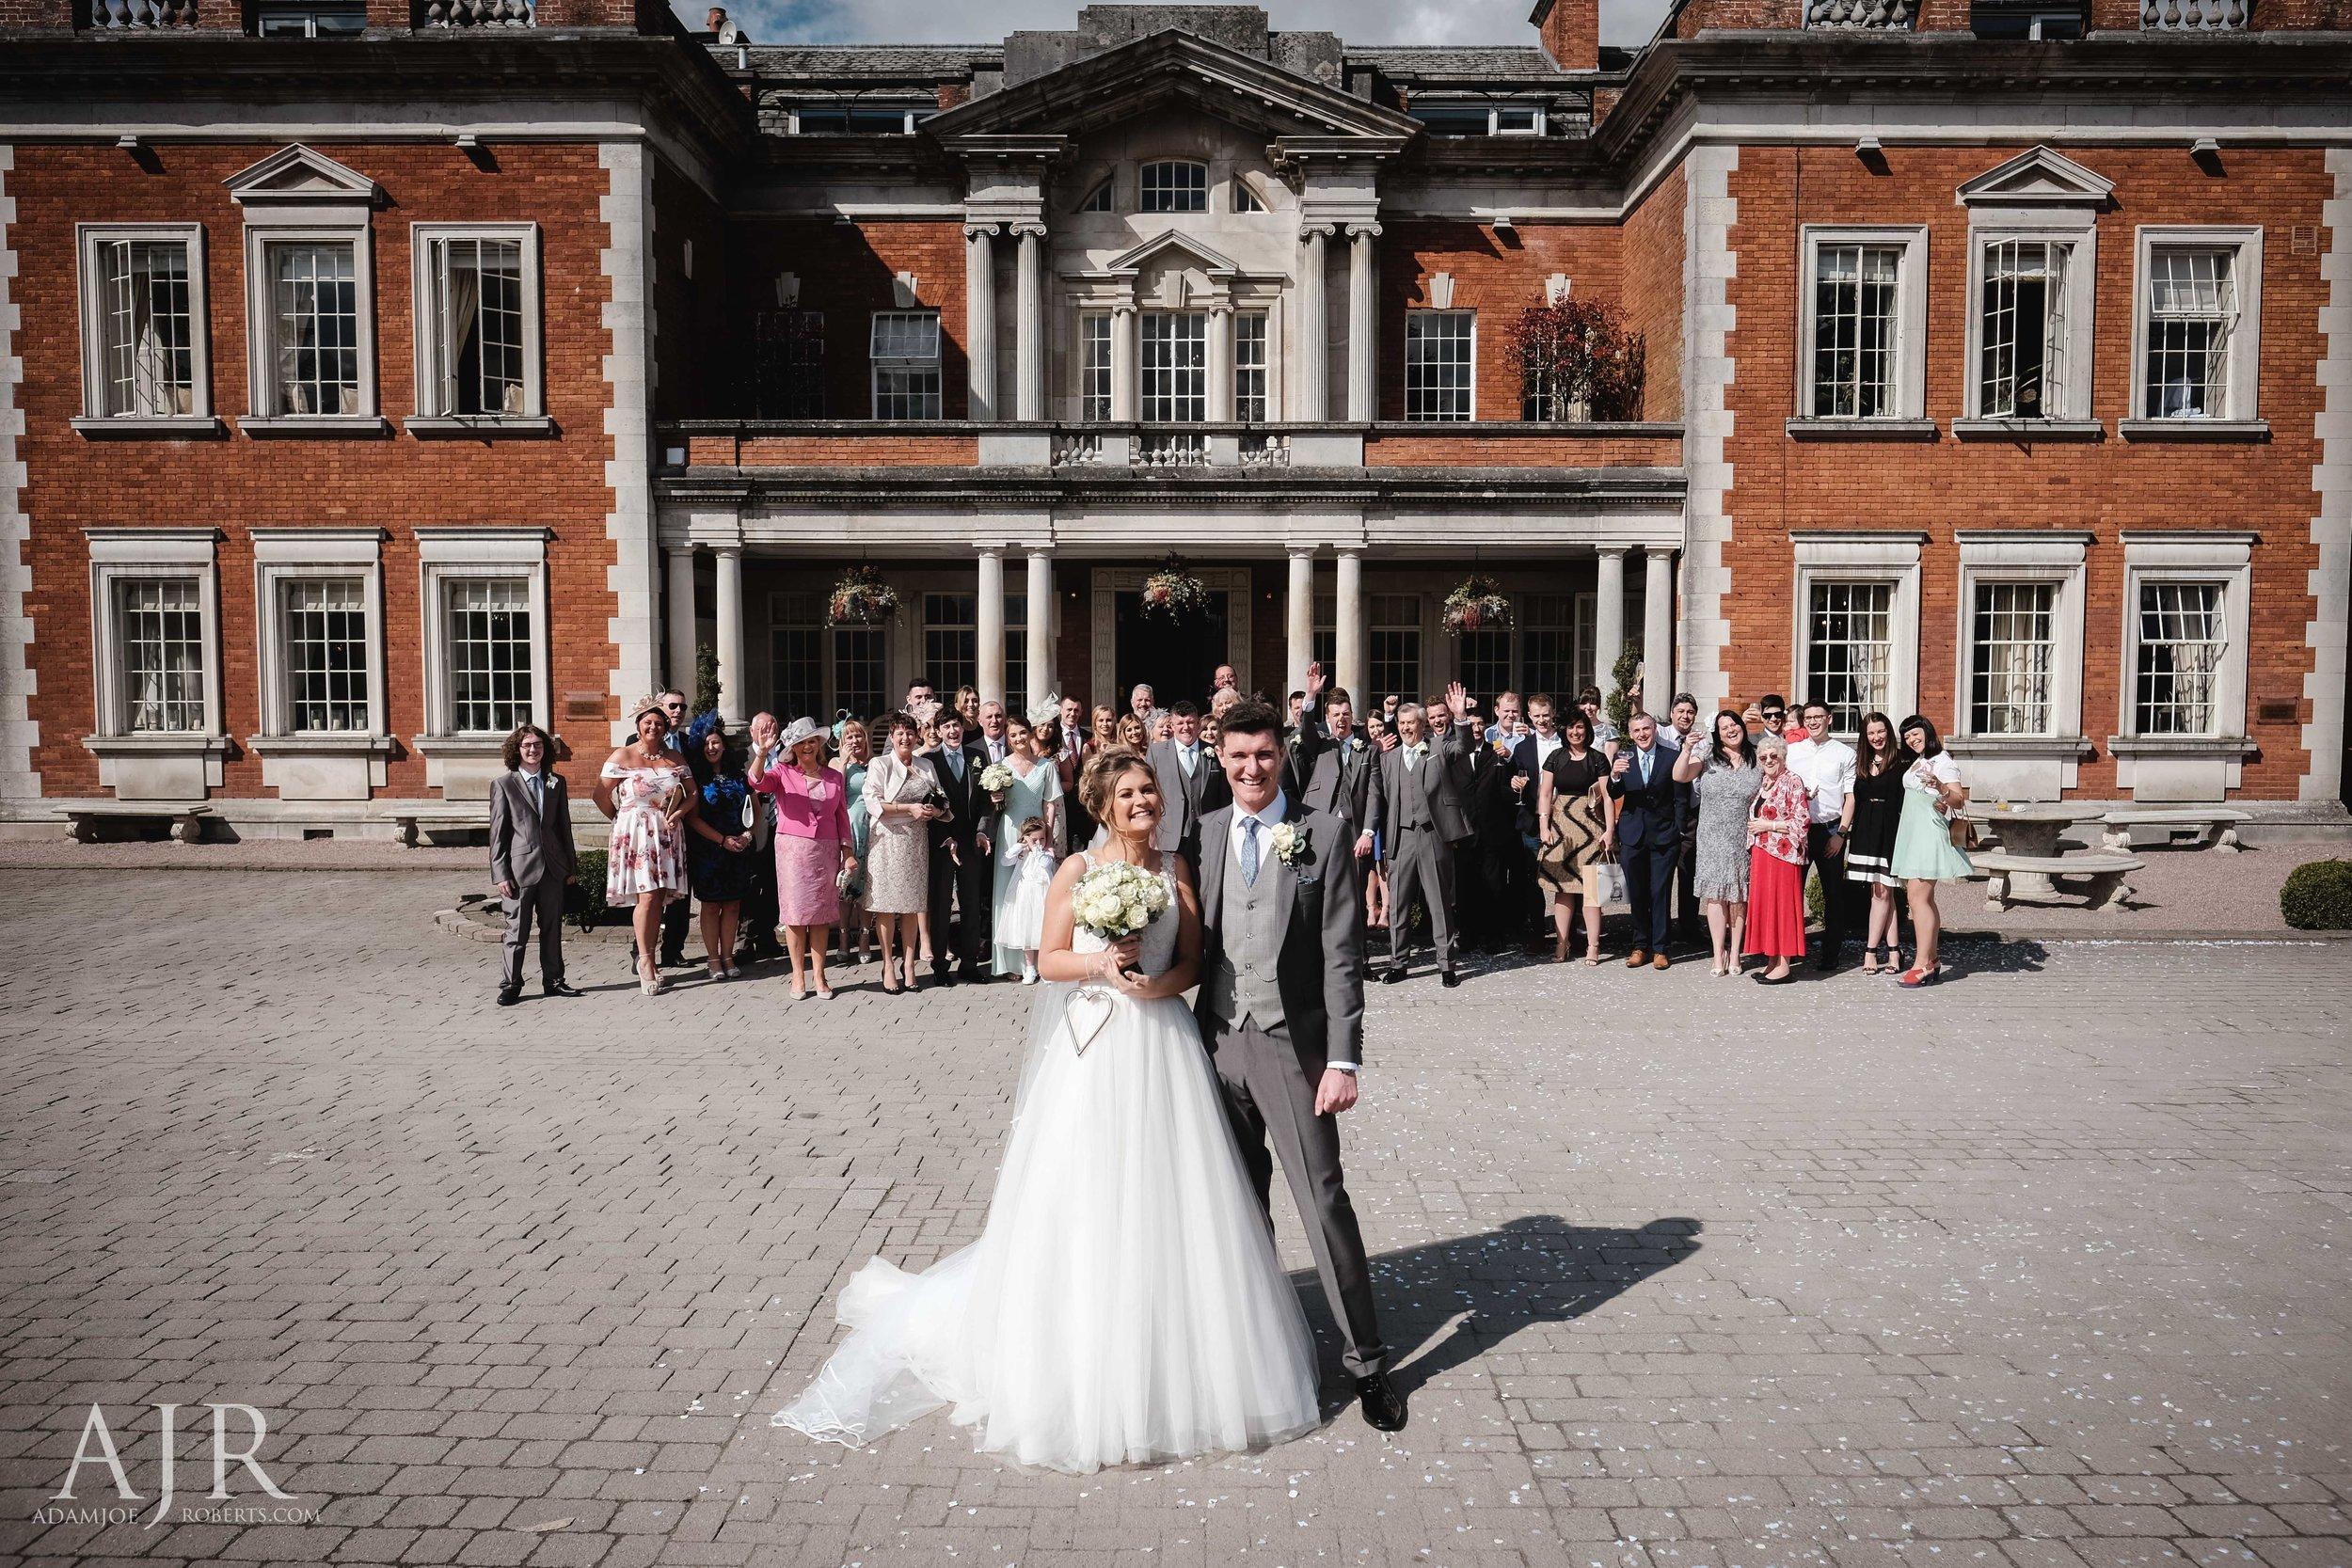 Eaves hall documenrty wedding photography | widnes cheshire wedding photographer sneak peek (8 of 11).jpg